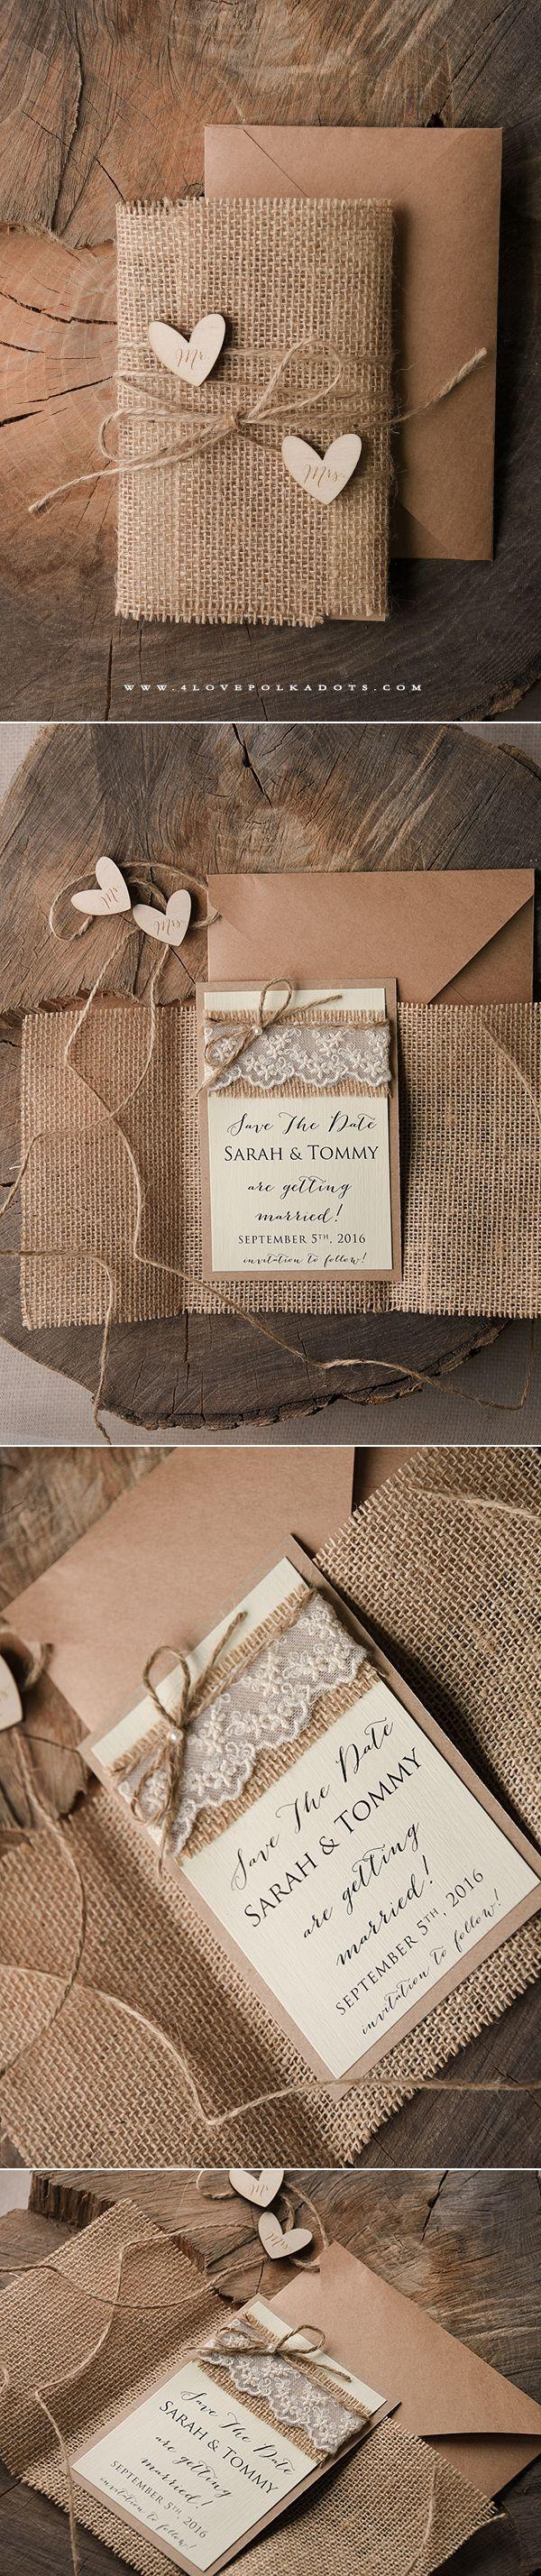 15 beautiful rustic DIY wedding invitations 193